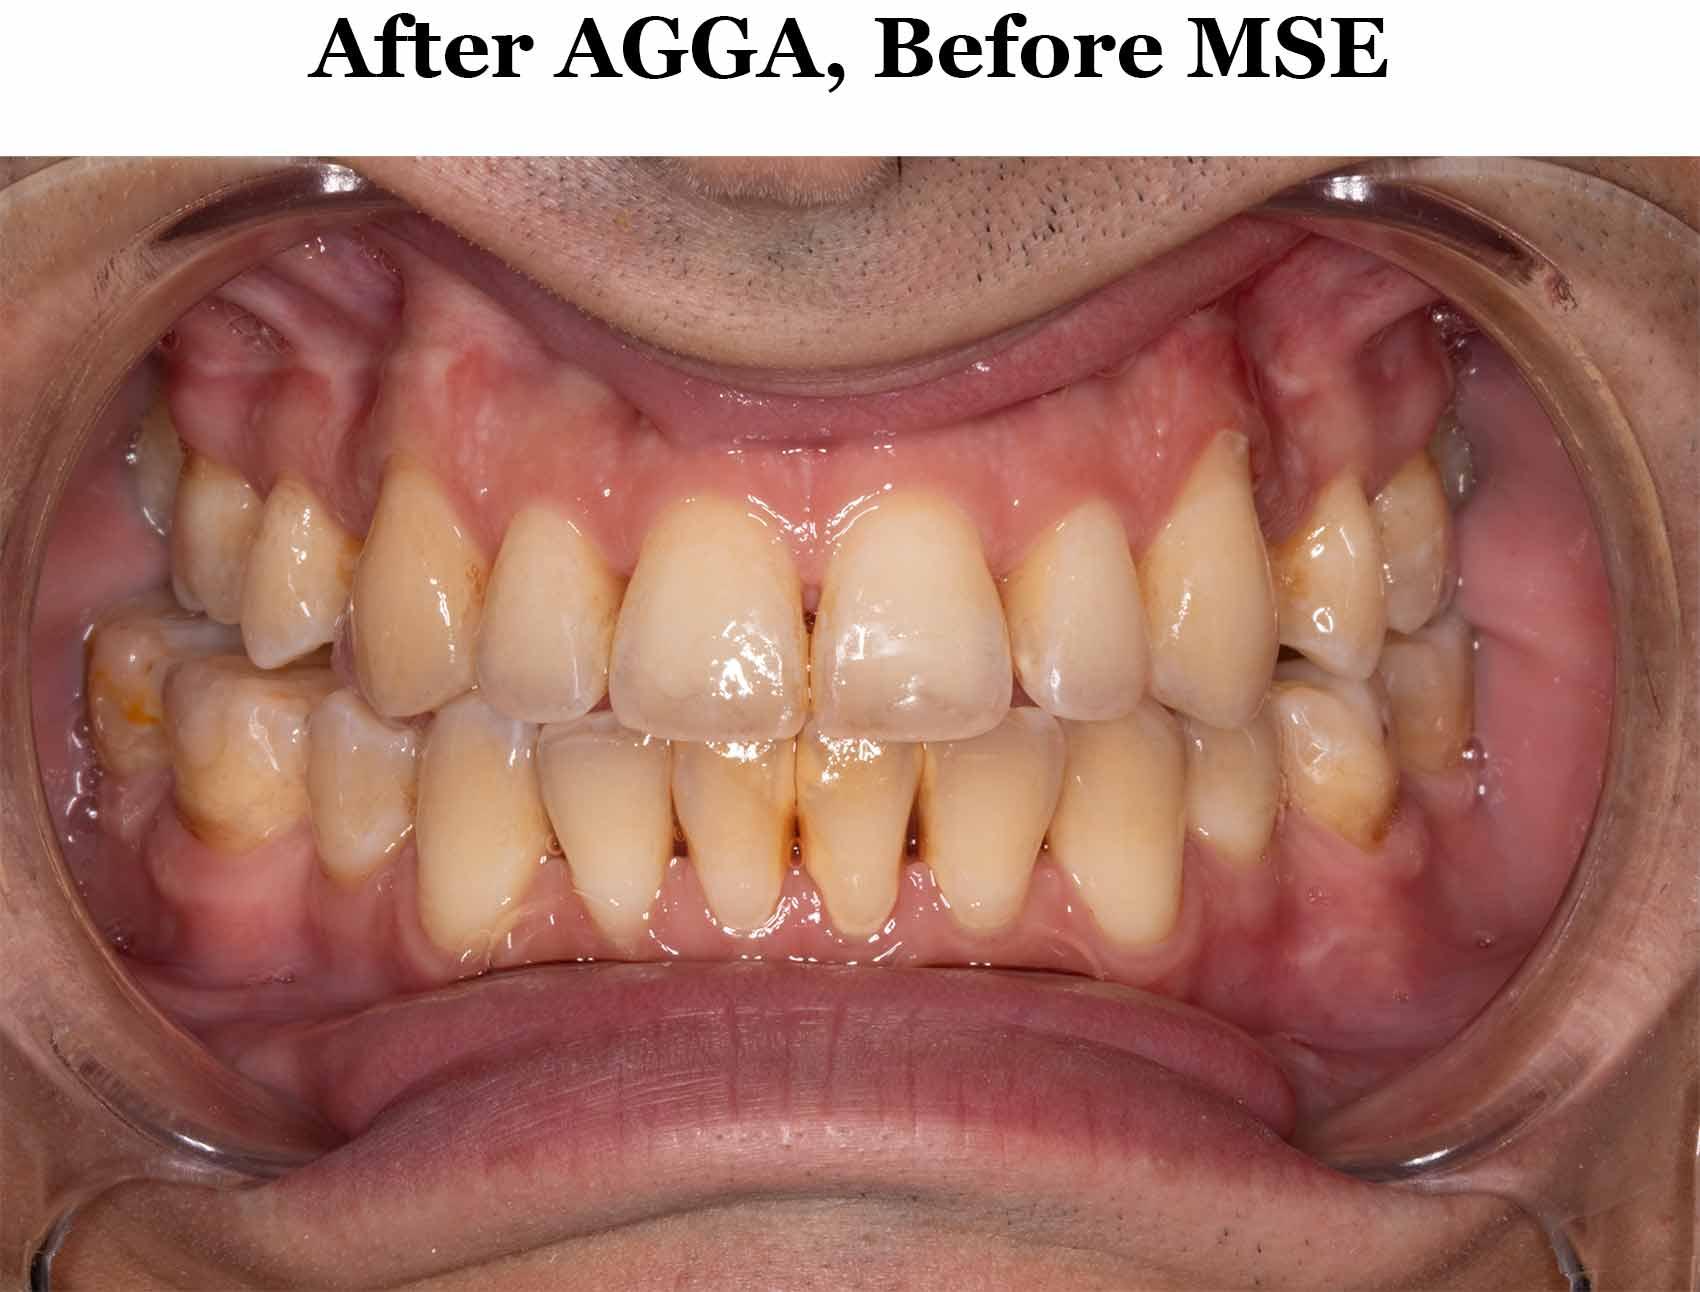 Before MSE_Smile Lips Spread.jpg